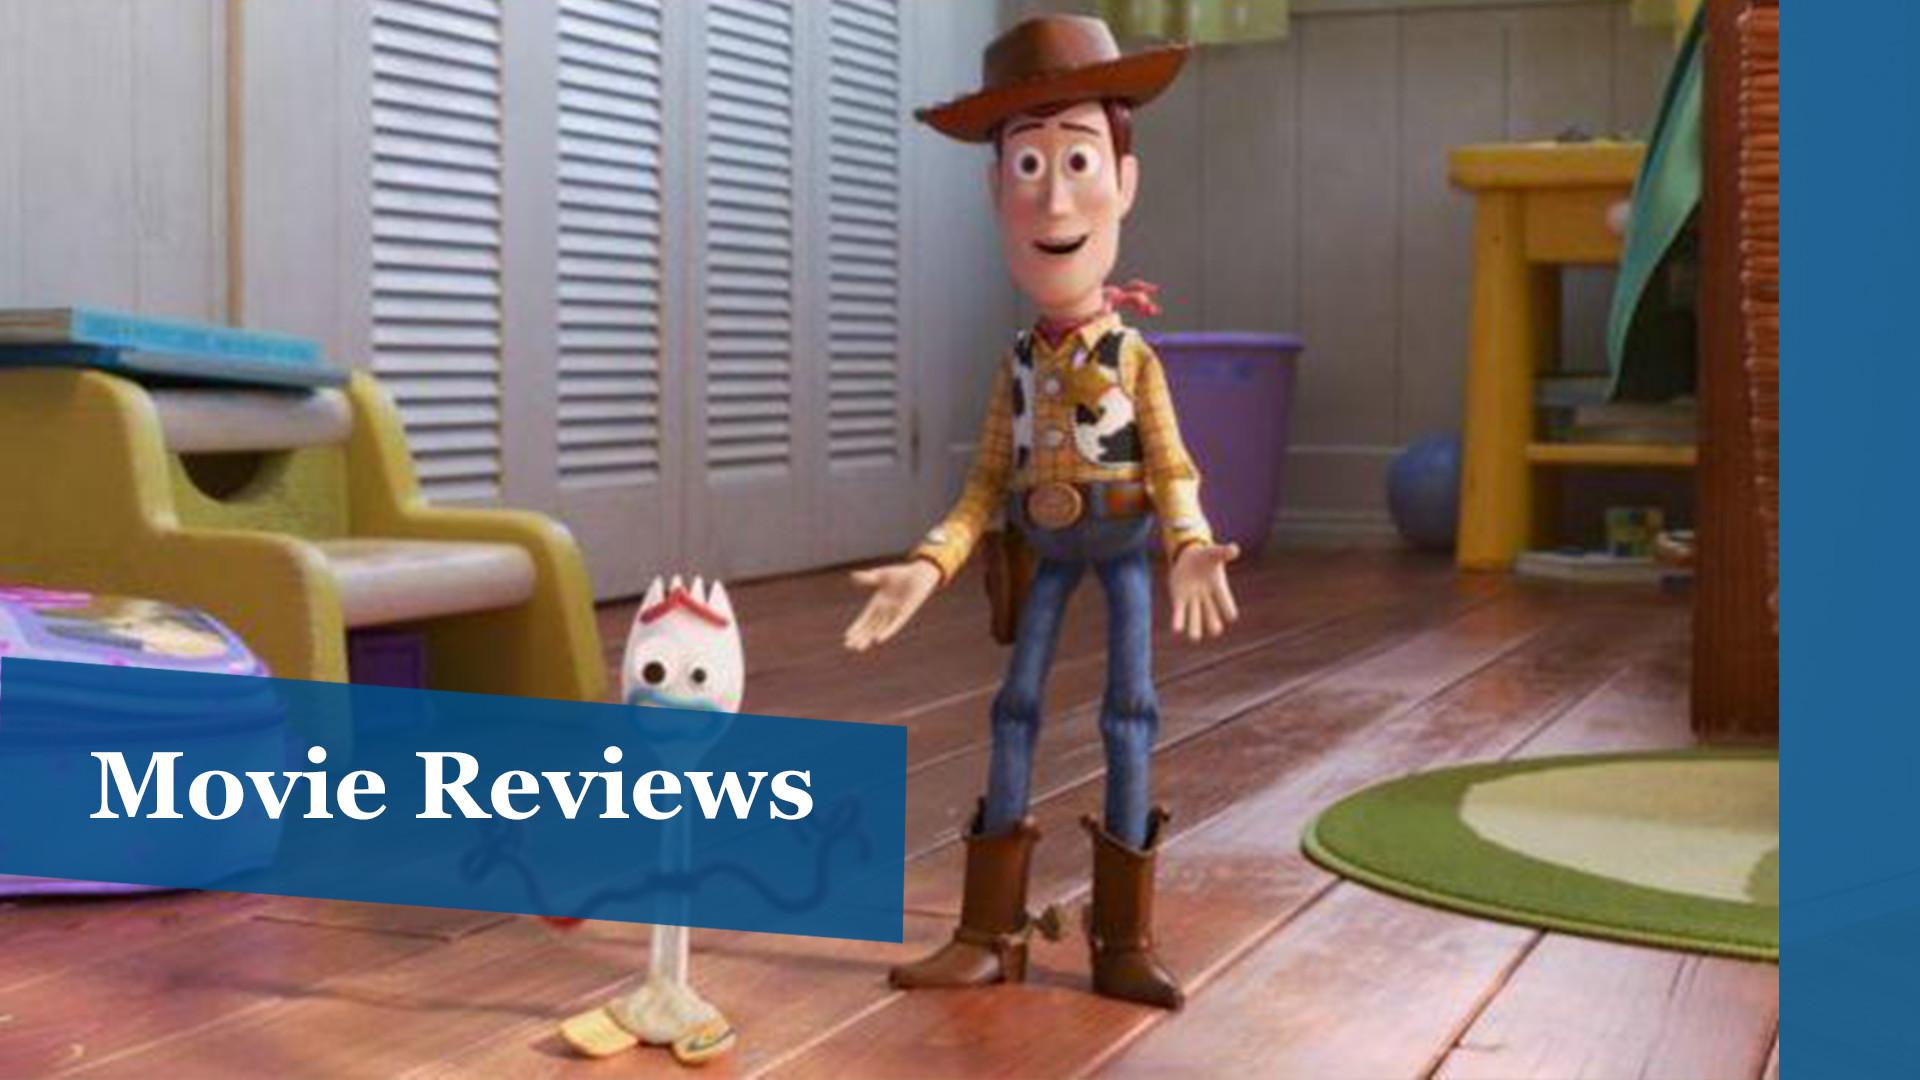 Latest movie reviews